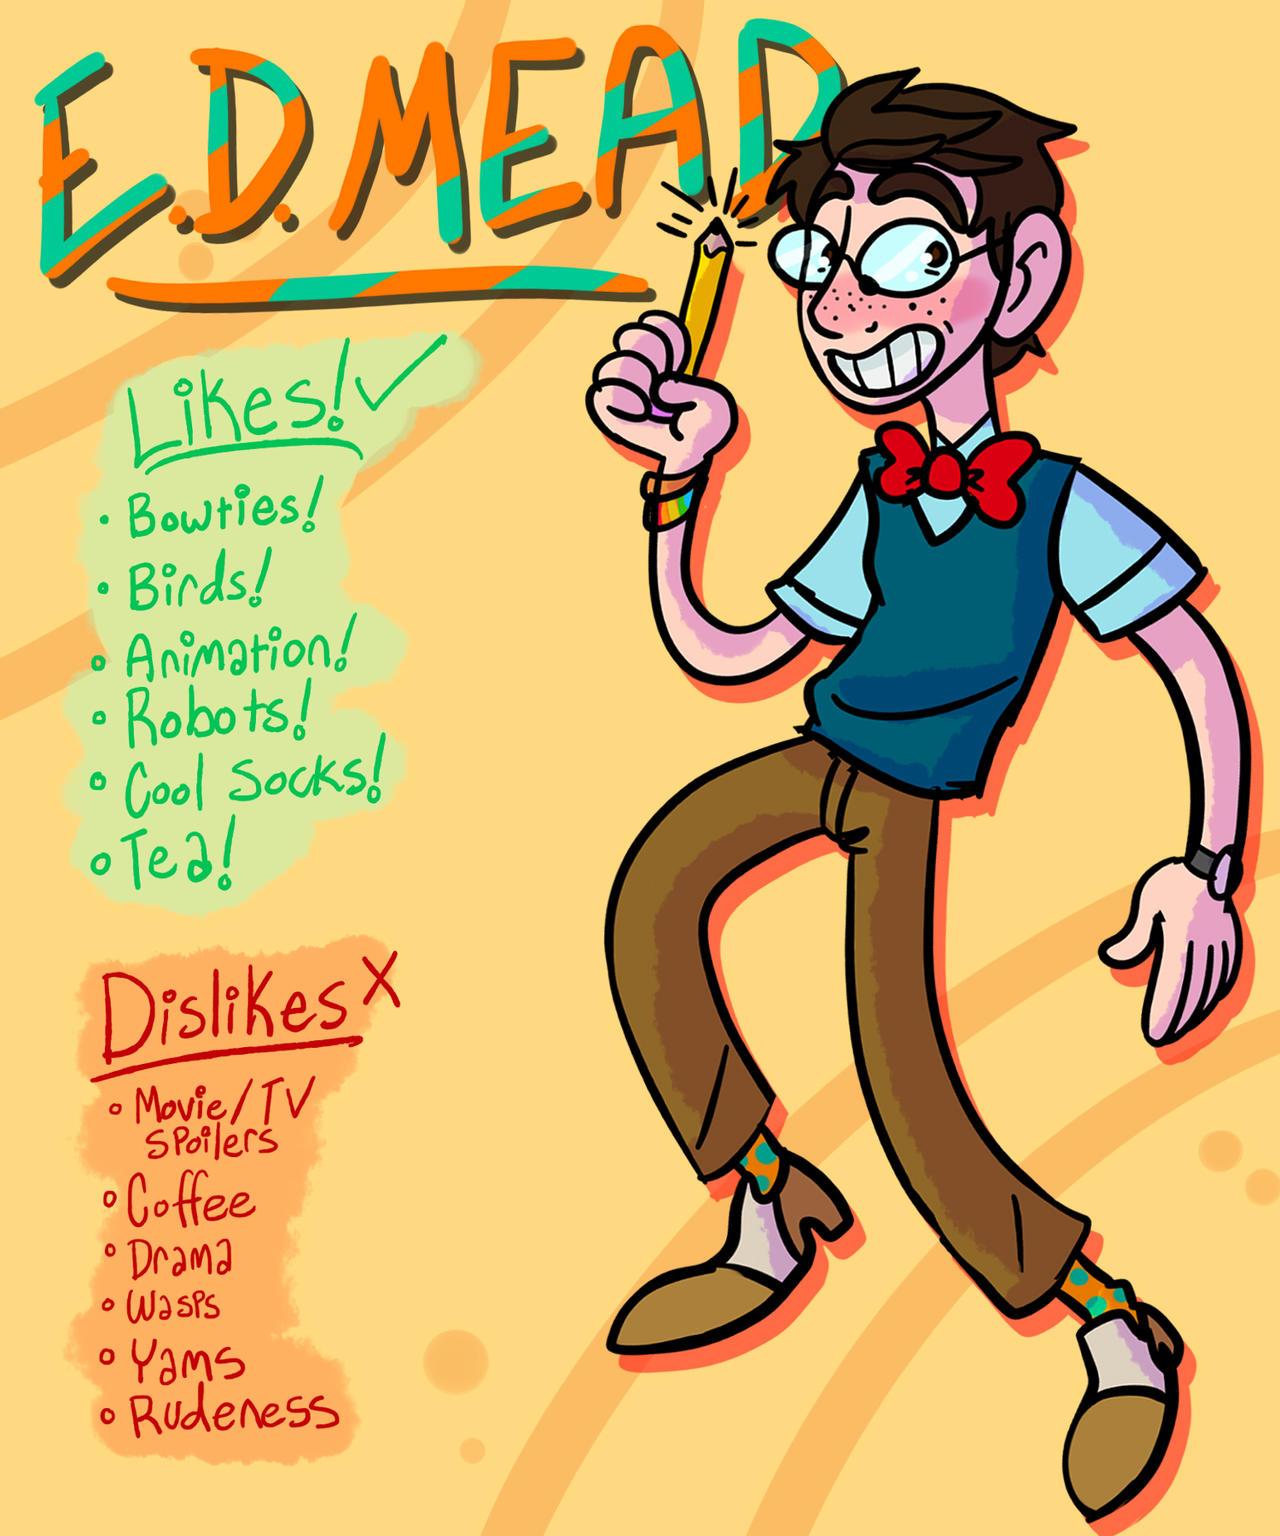 EDMeadArt's Profile Picture